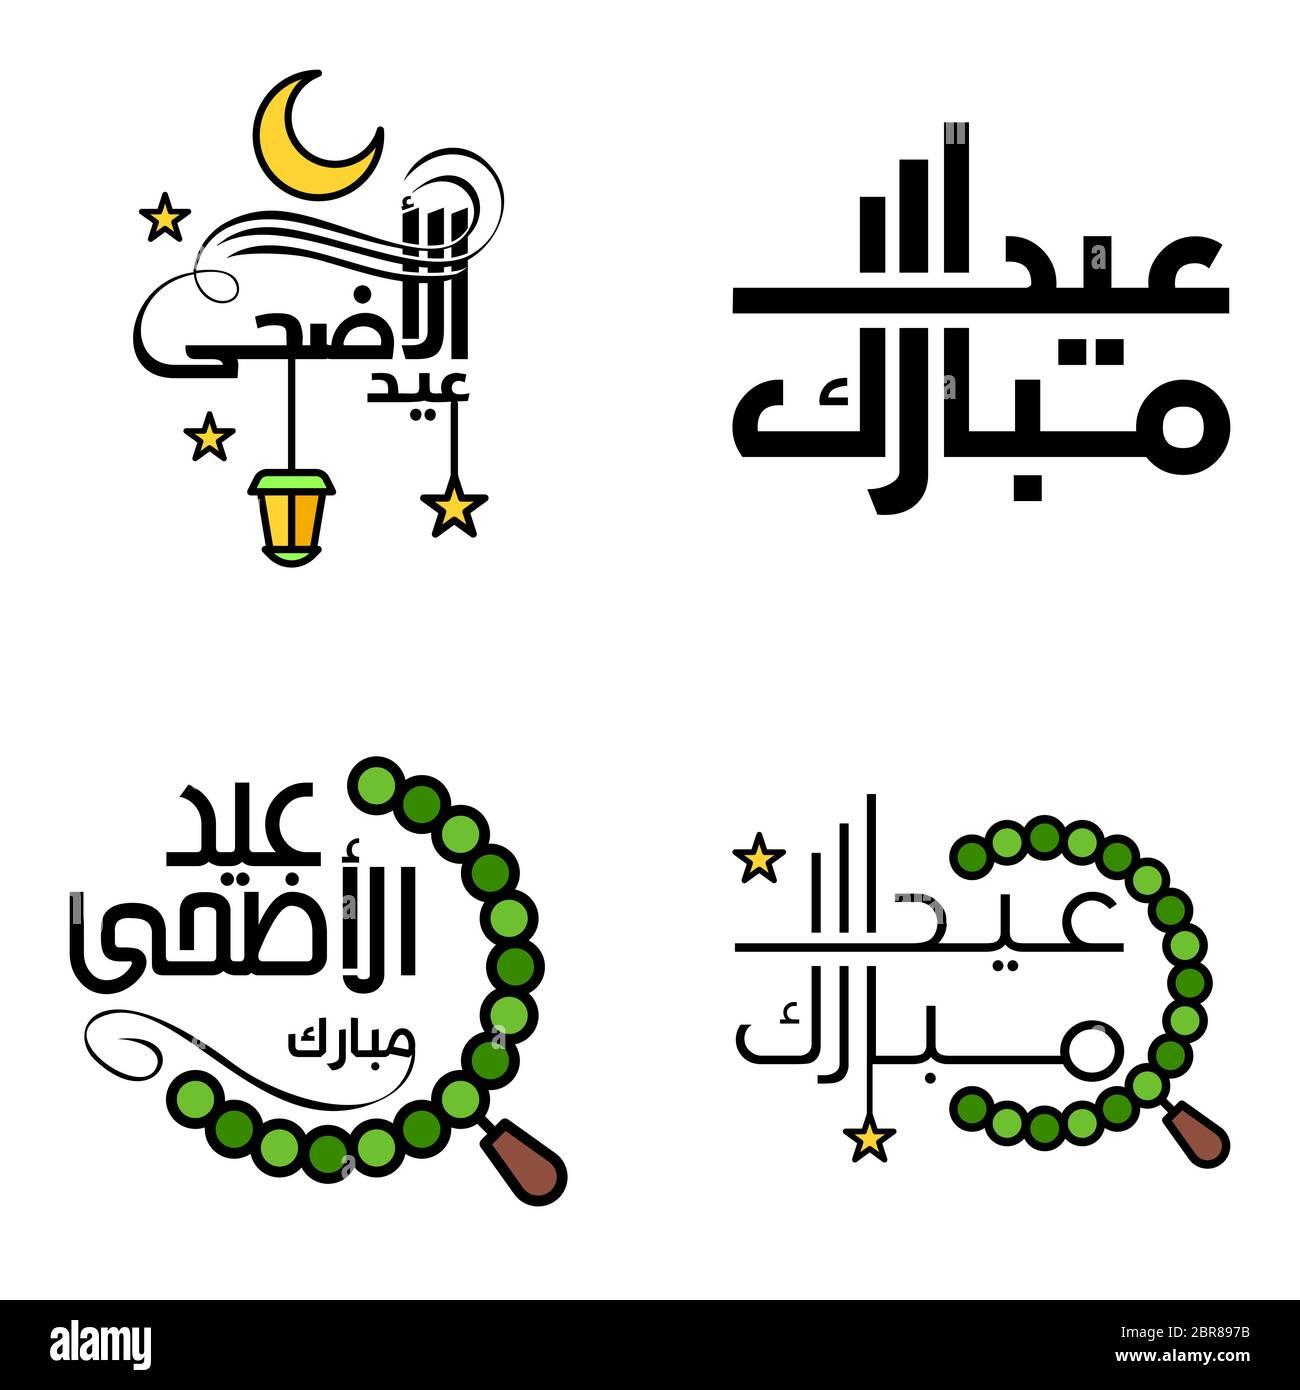 Modern Arabic Calligraphy Text Of Eid Mubarak Pack Of 4 For The Celebration Of Muslim Community Festival Eid Al Adha And Eid Al Fitr Stock Vector Image Art Alamy